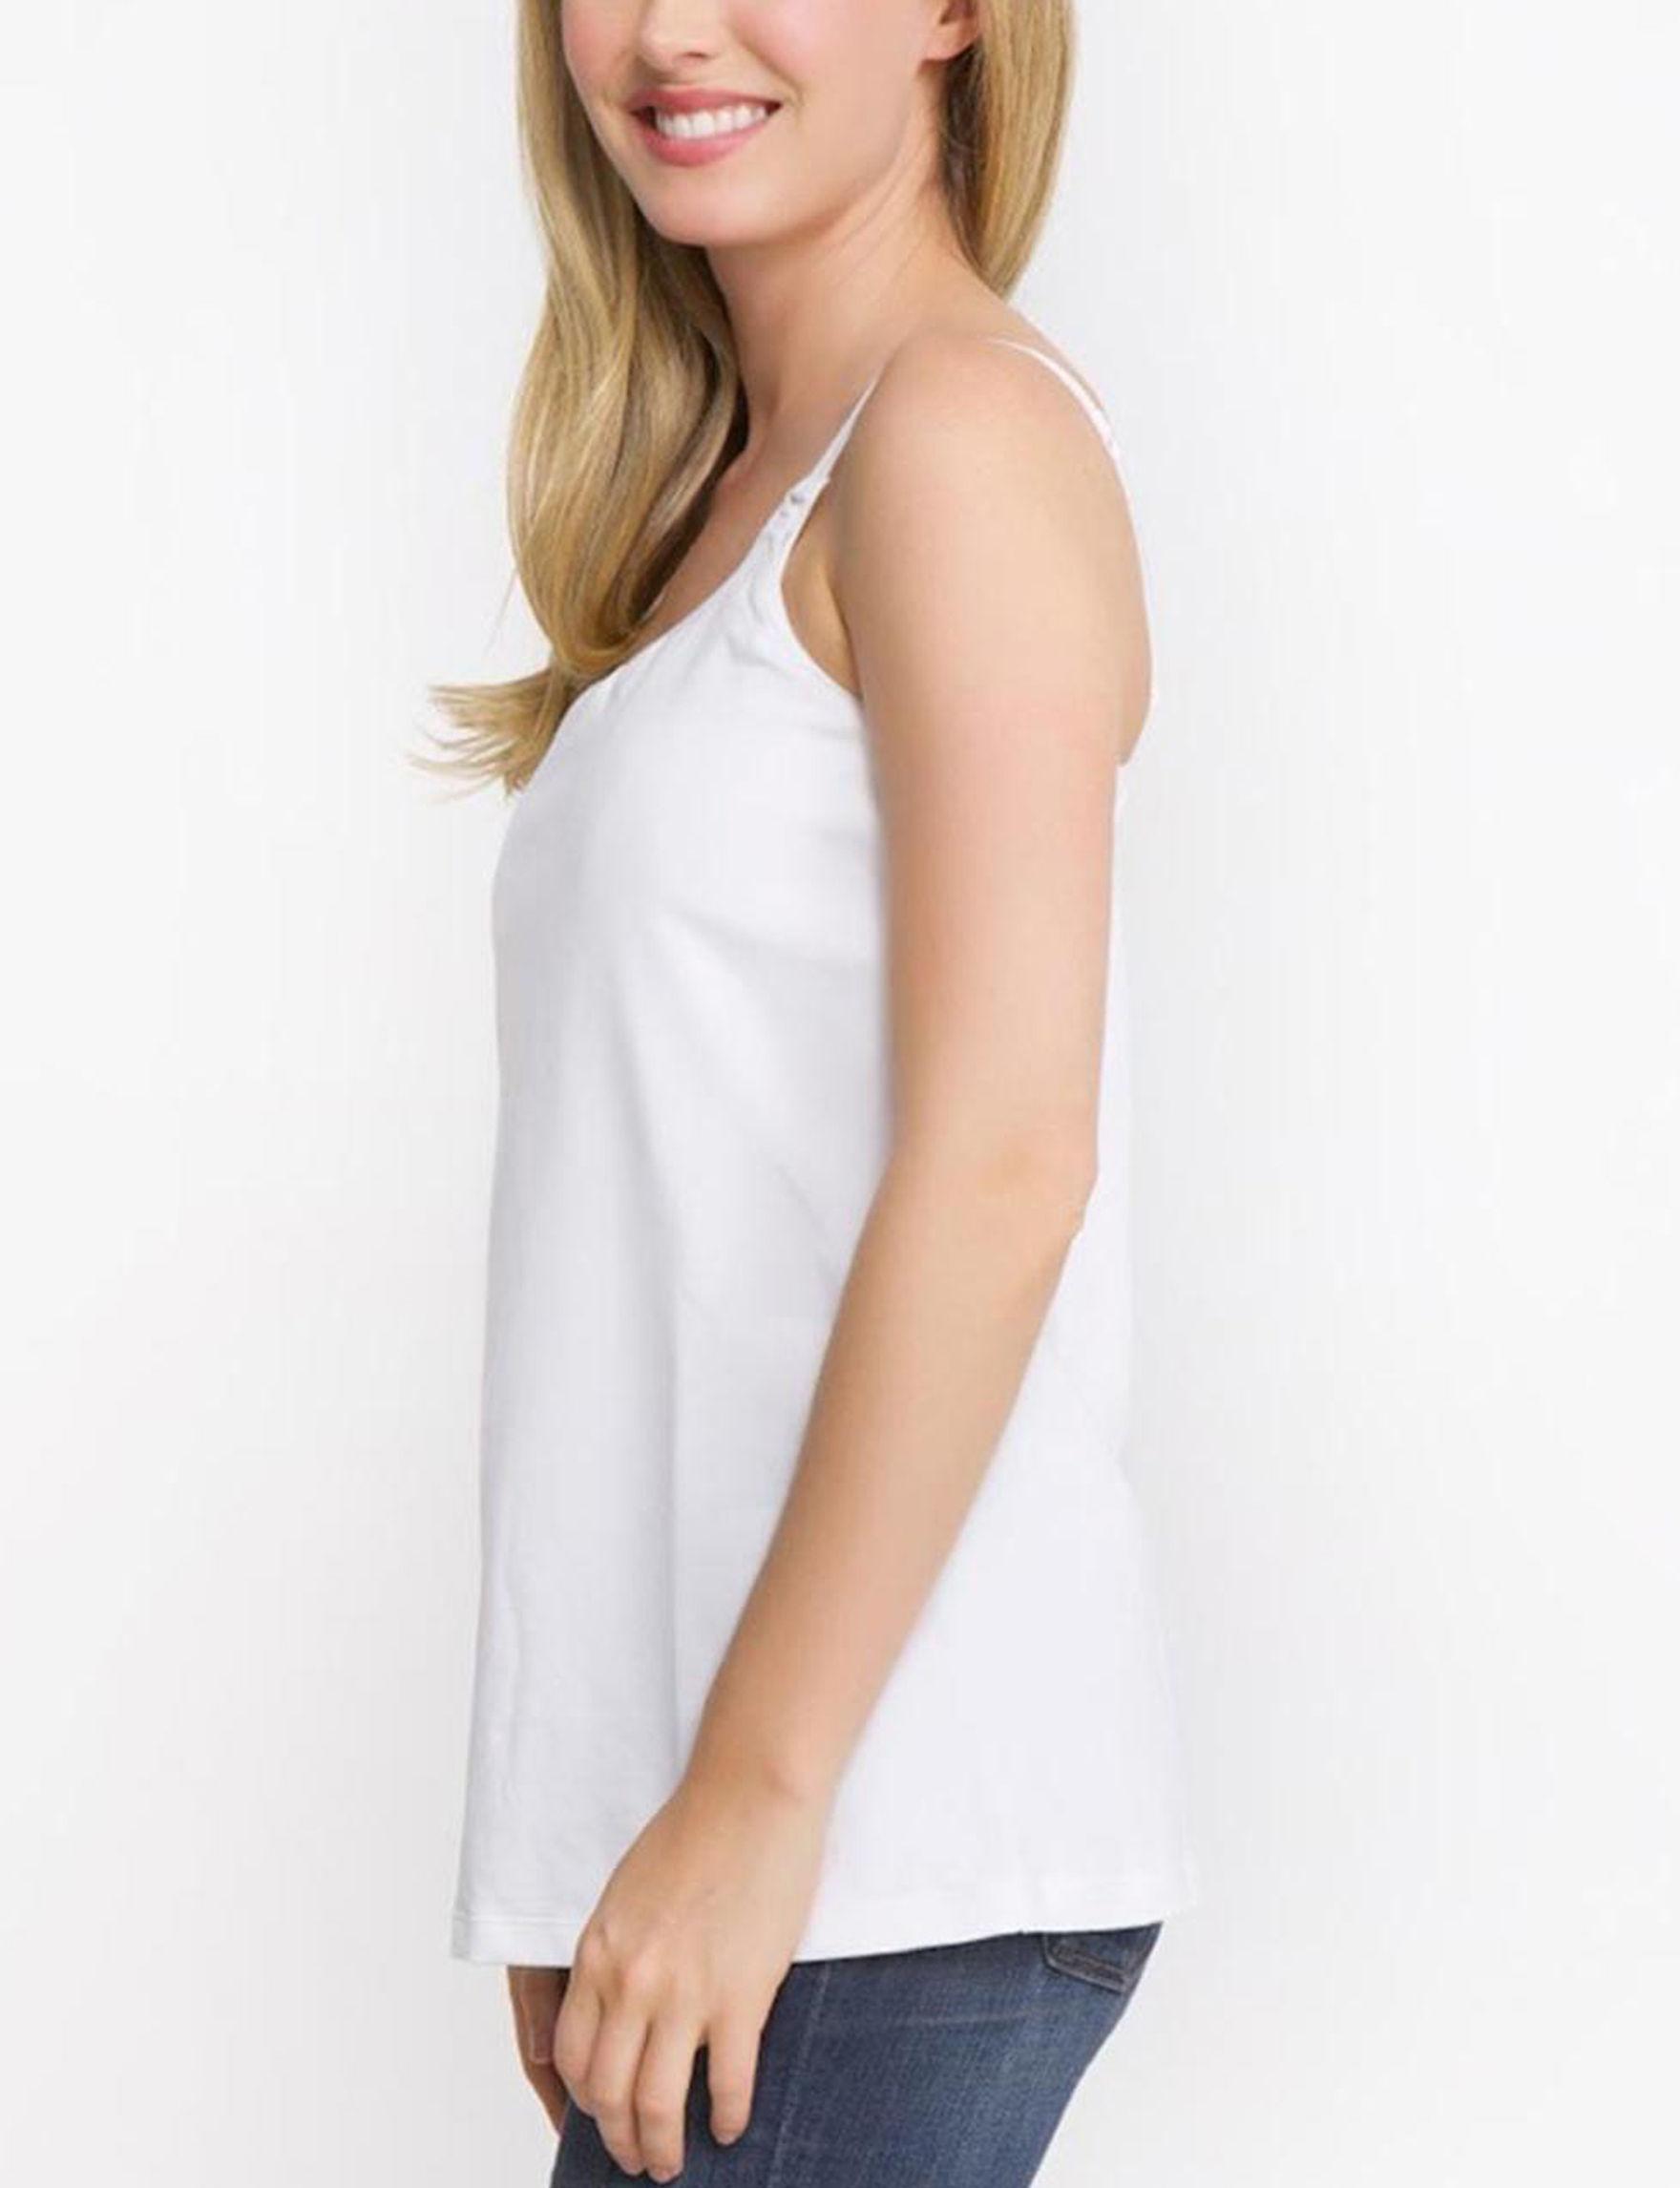 La Leche League White Slips & Shapewear